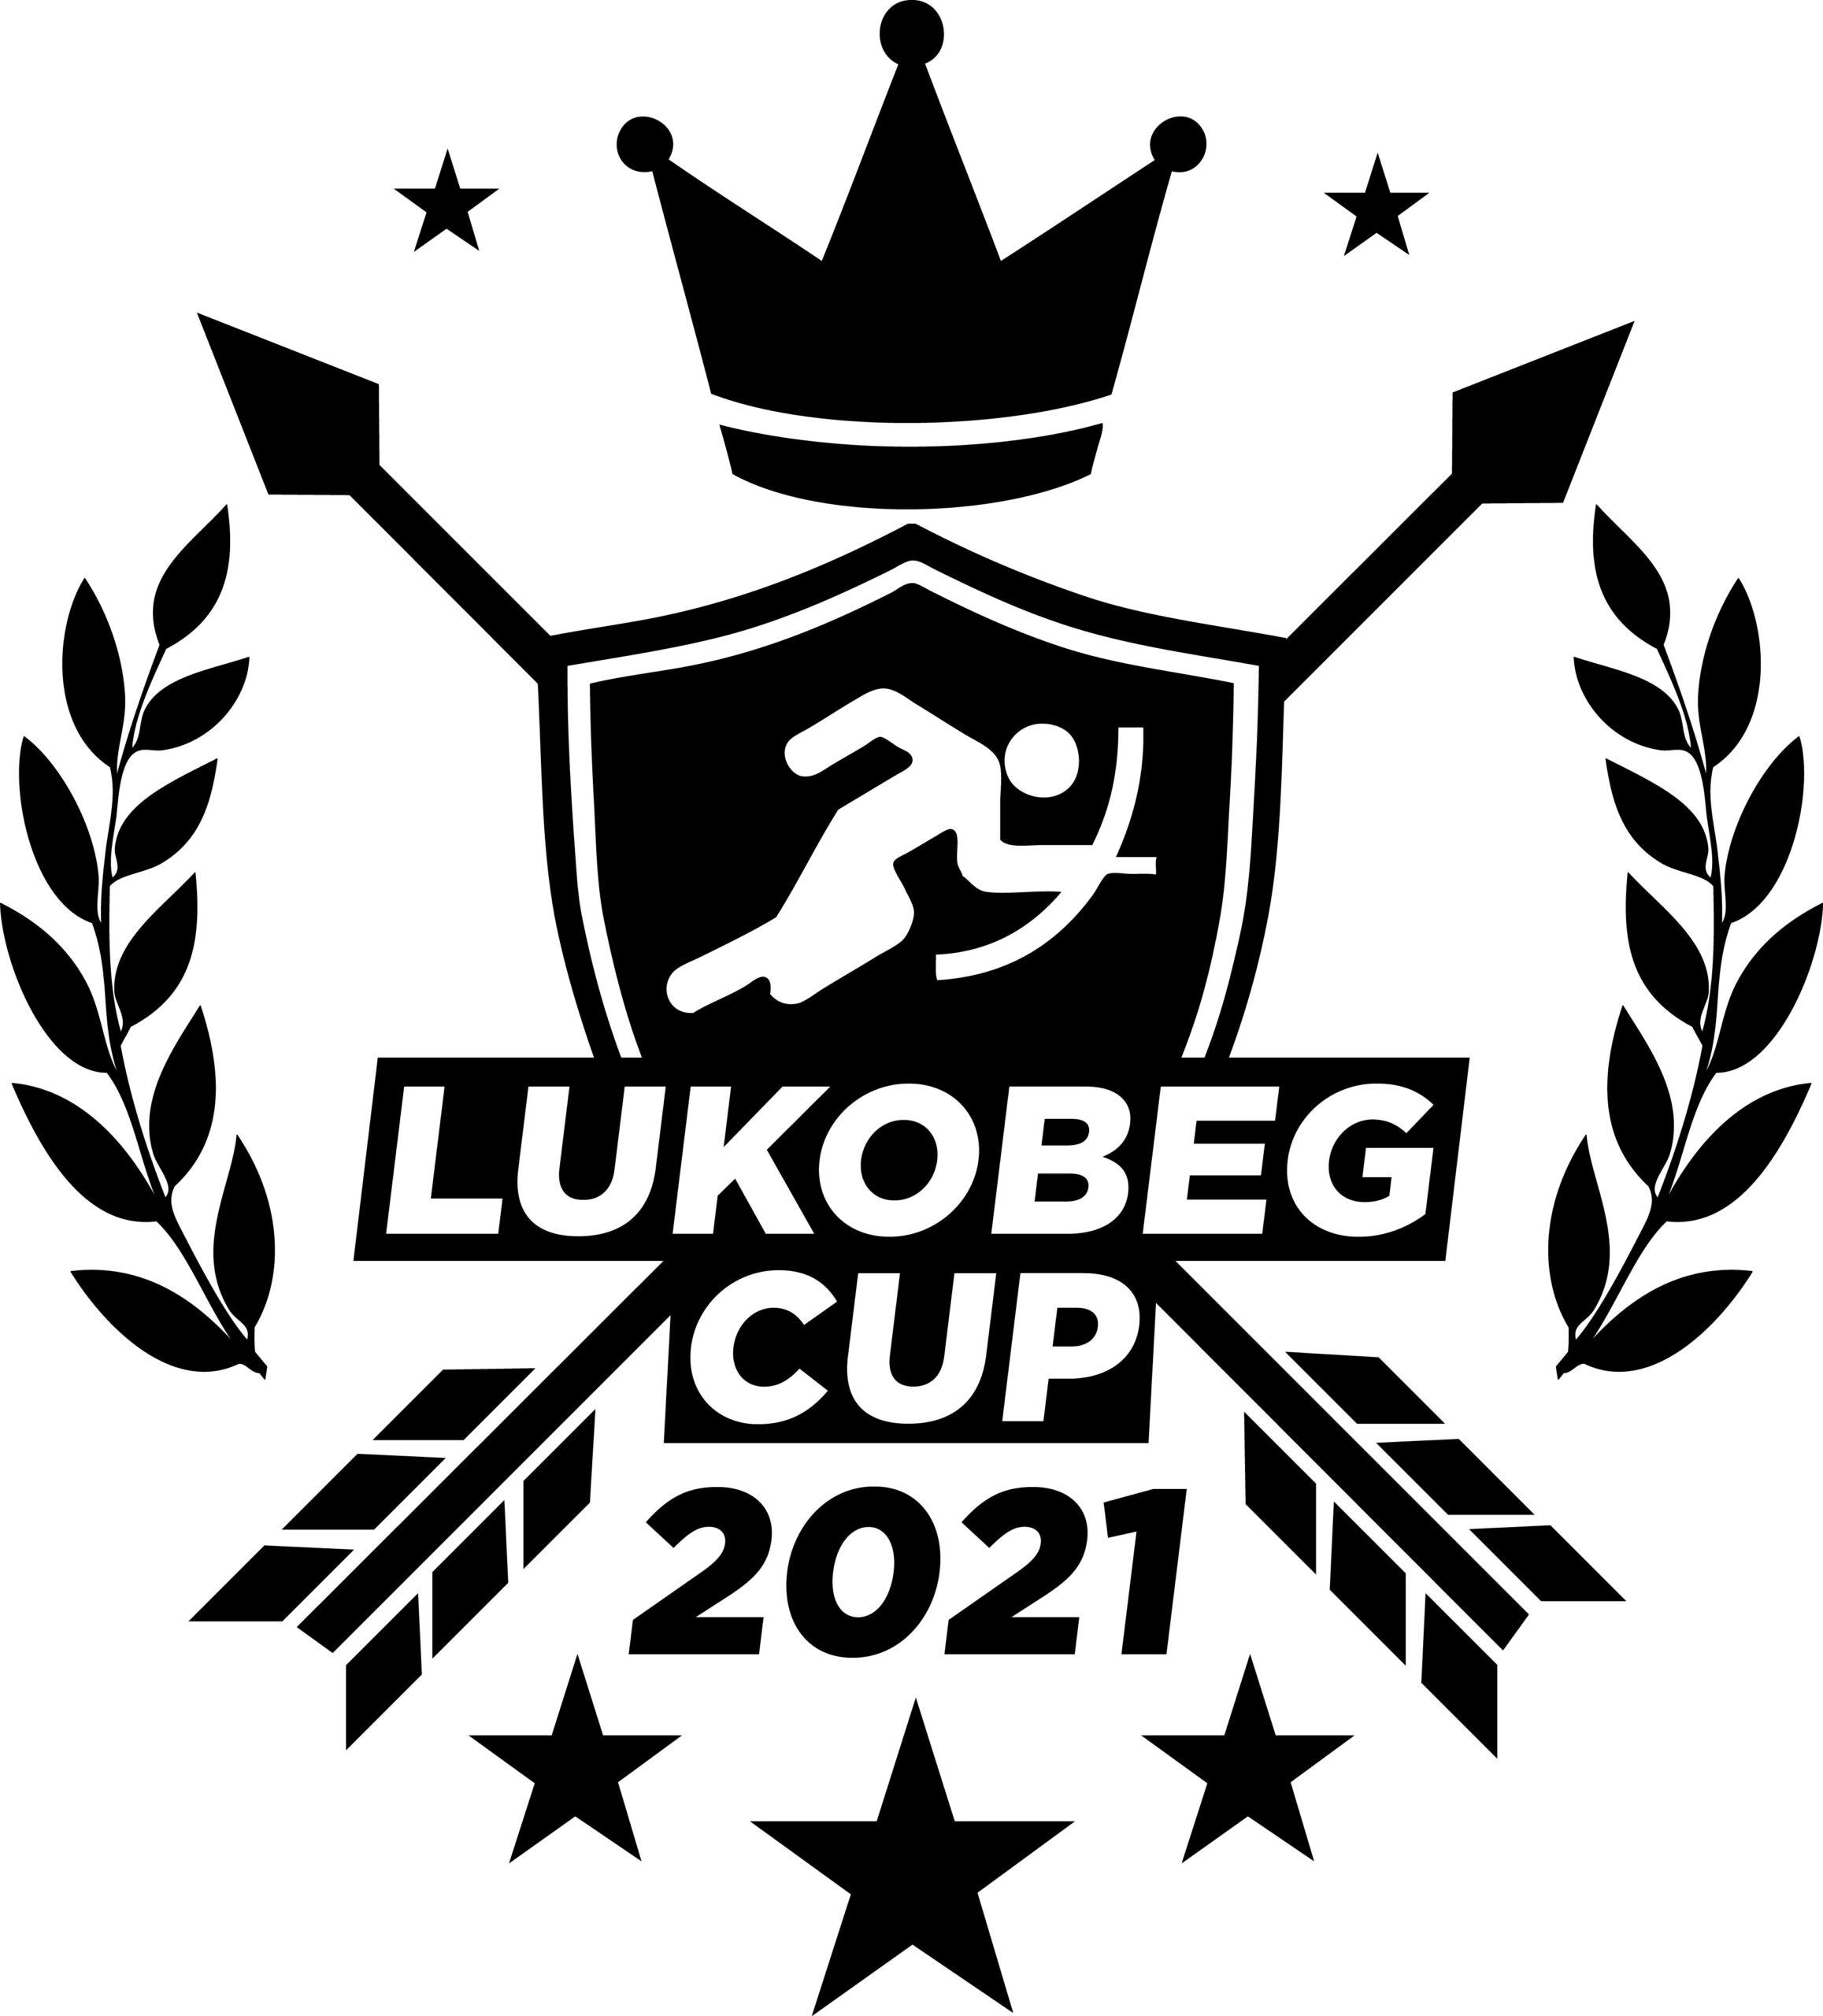 Представляем лого Кубка по лукобегу